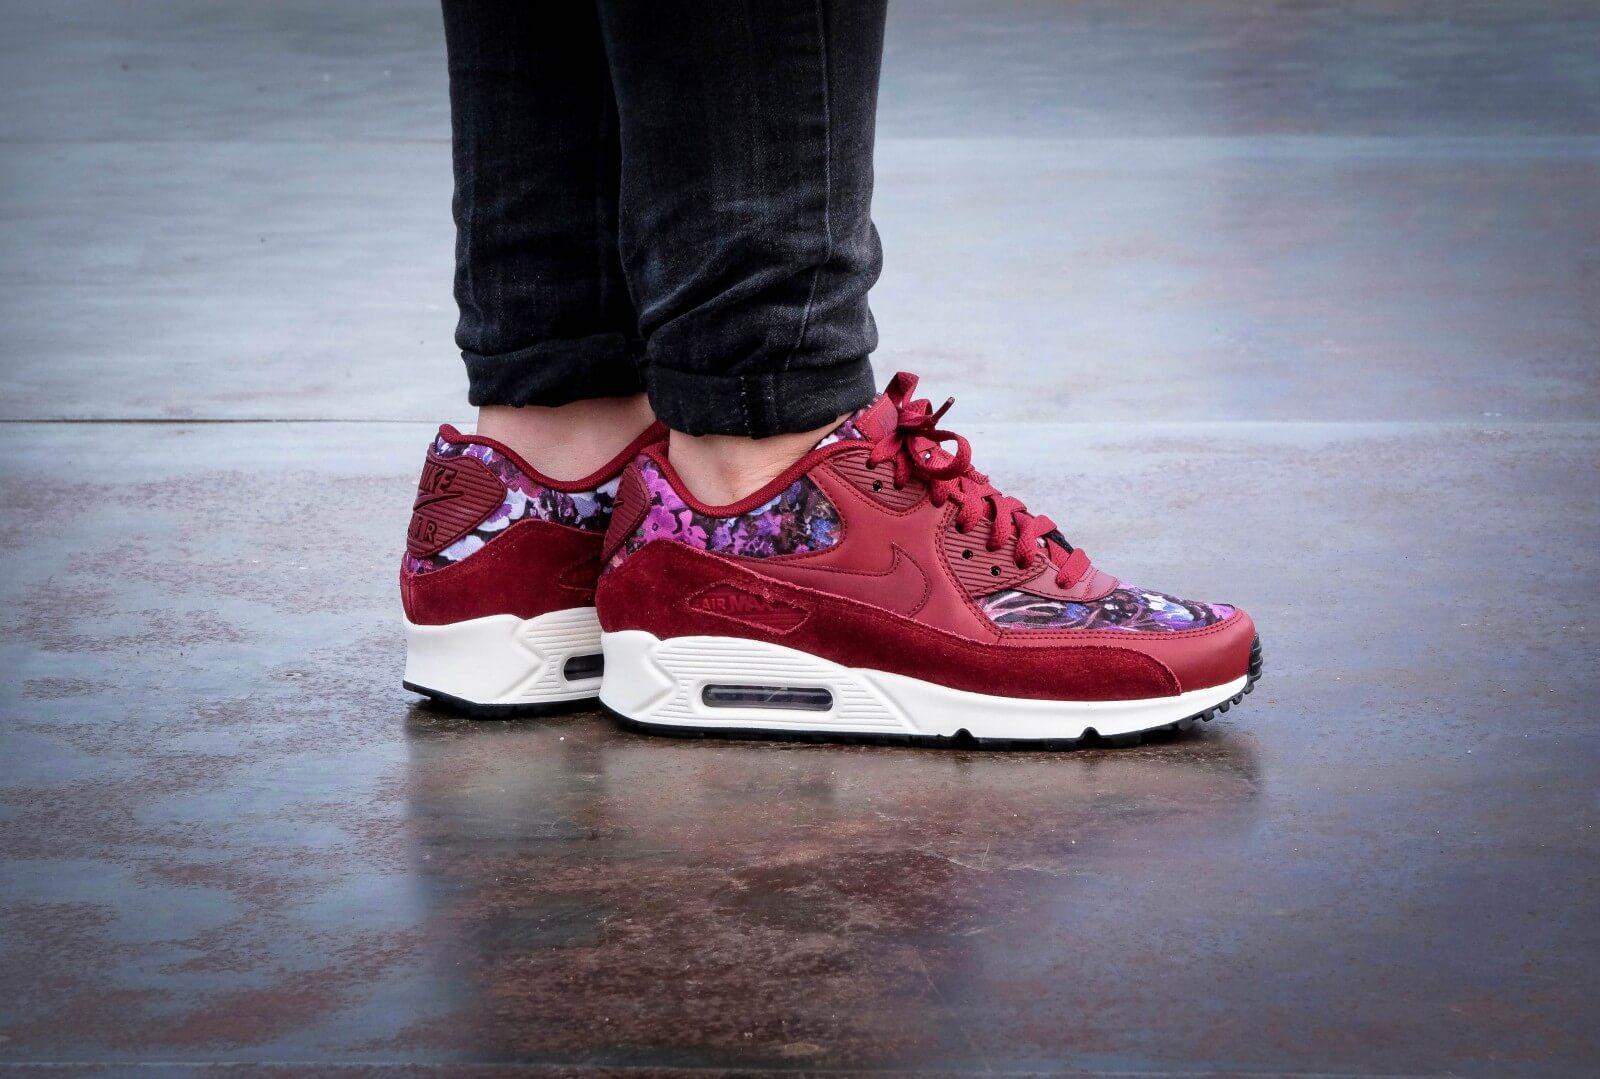 Nike Air Presto Premium Women's Sneaker in Night MaroonSail